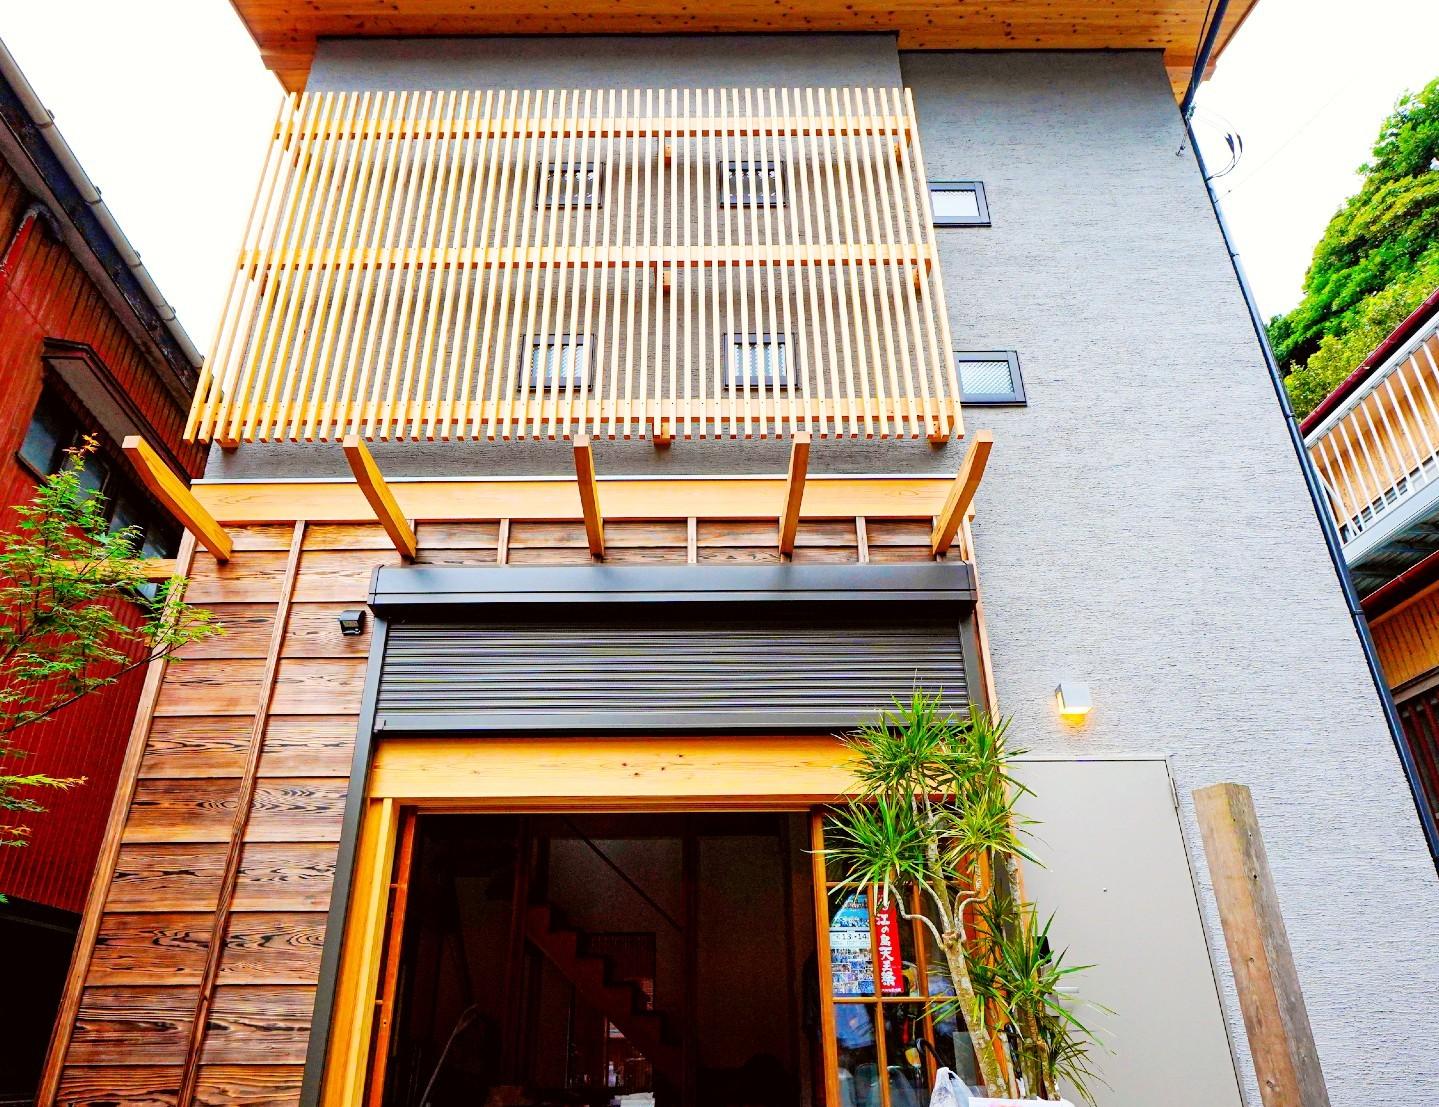 木賃屋 弥五郎 Enoshima Guesthouse